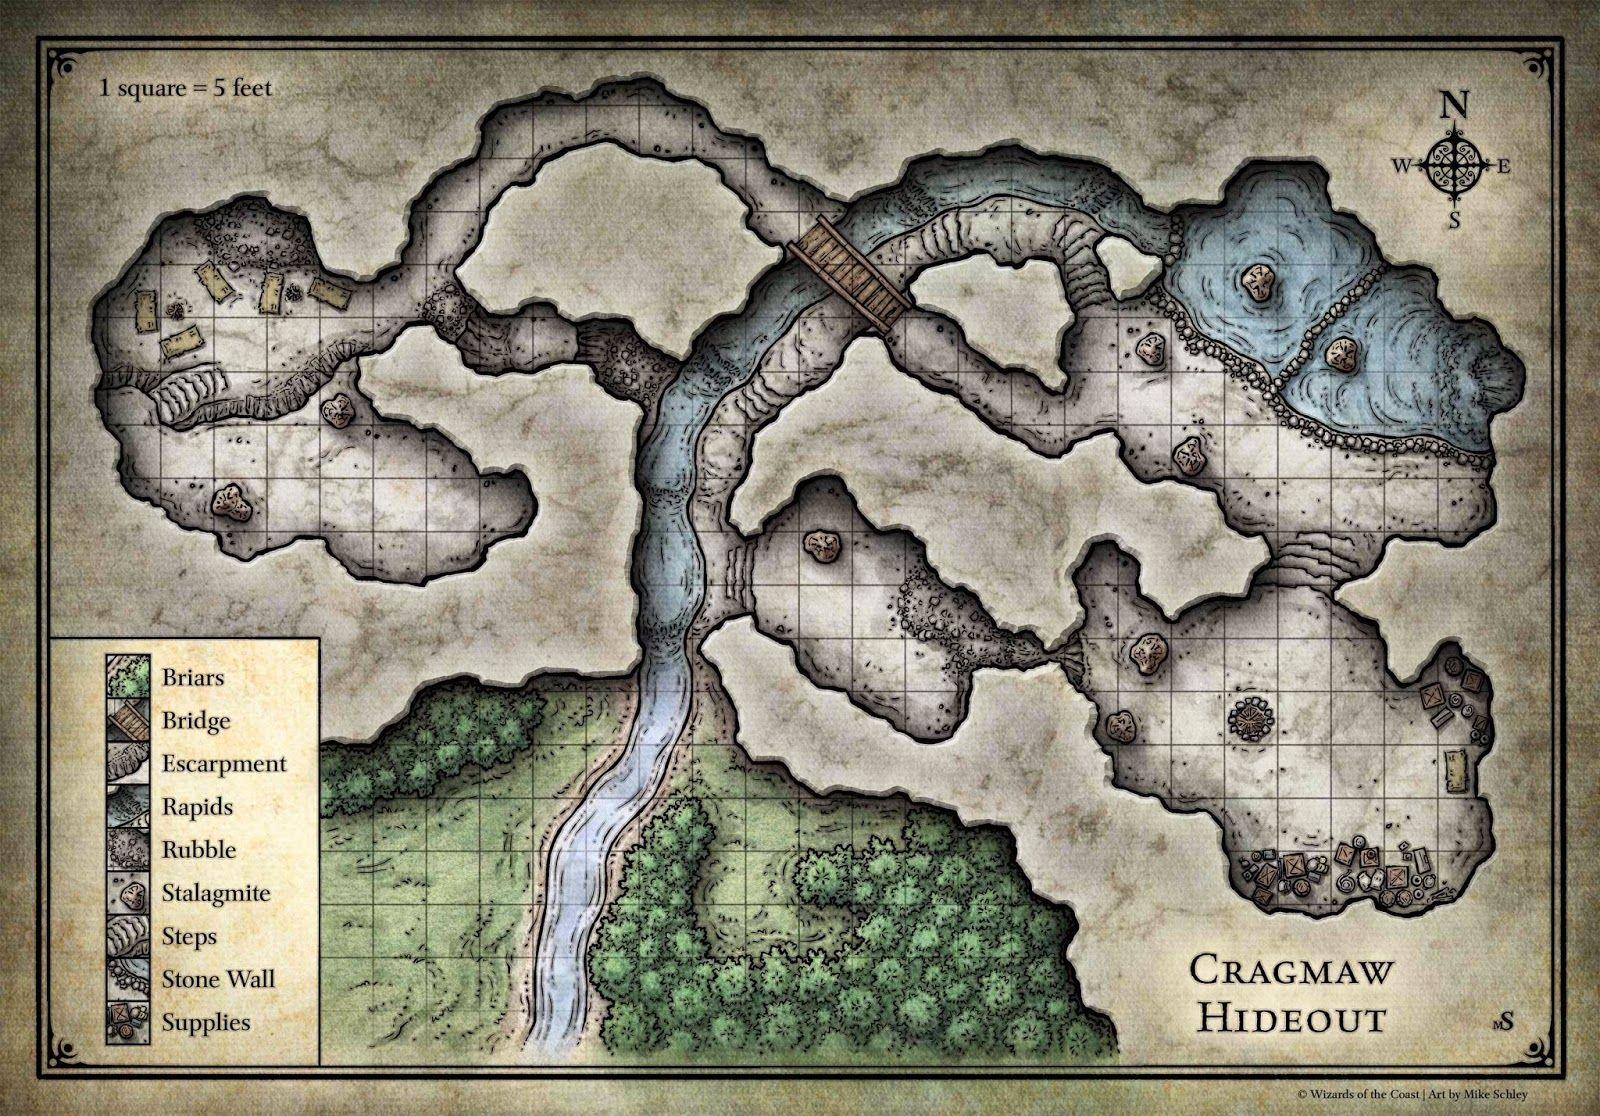 My Realms: Starter Set Sandbox 5 - Cragmaw Hideout, Cragmaw Castle, and the Cragmaw Goblins